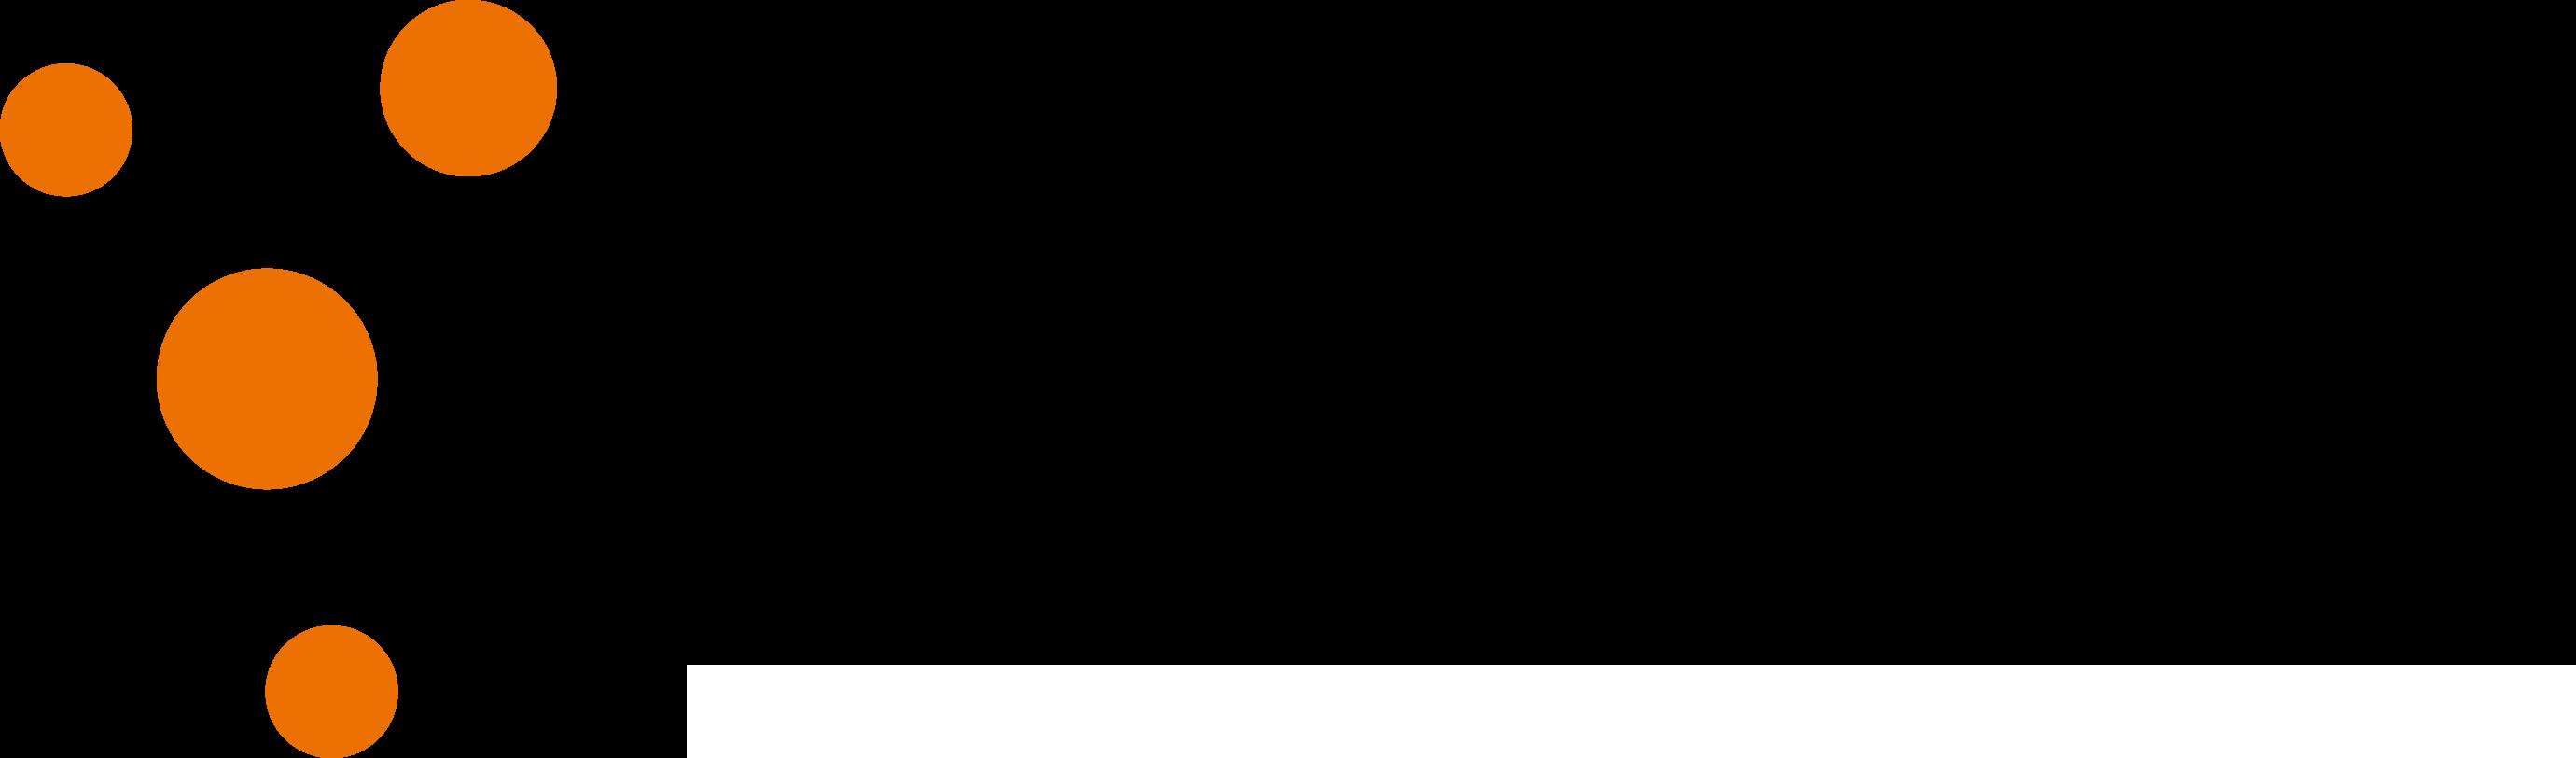 PHX_logotype_basic_2016_positive_transparent_RGB